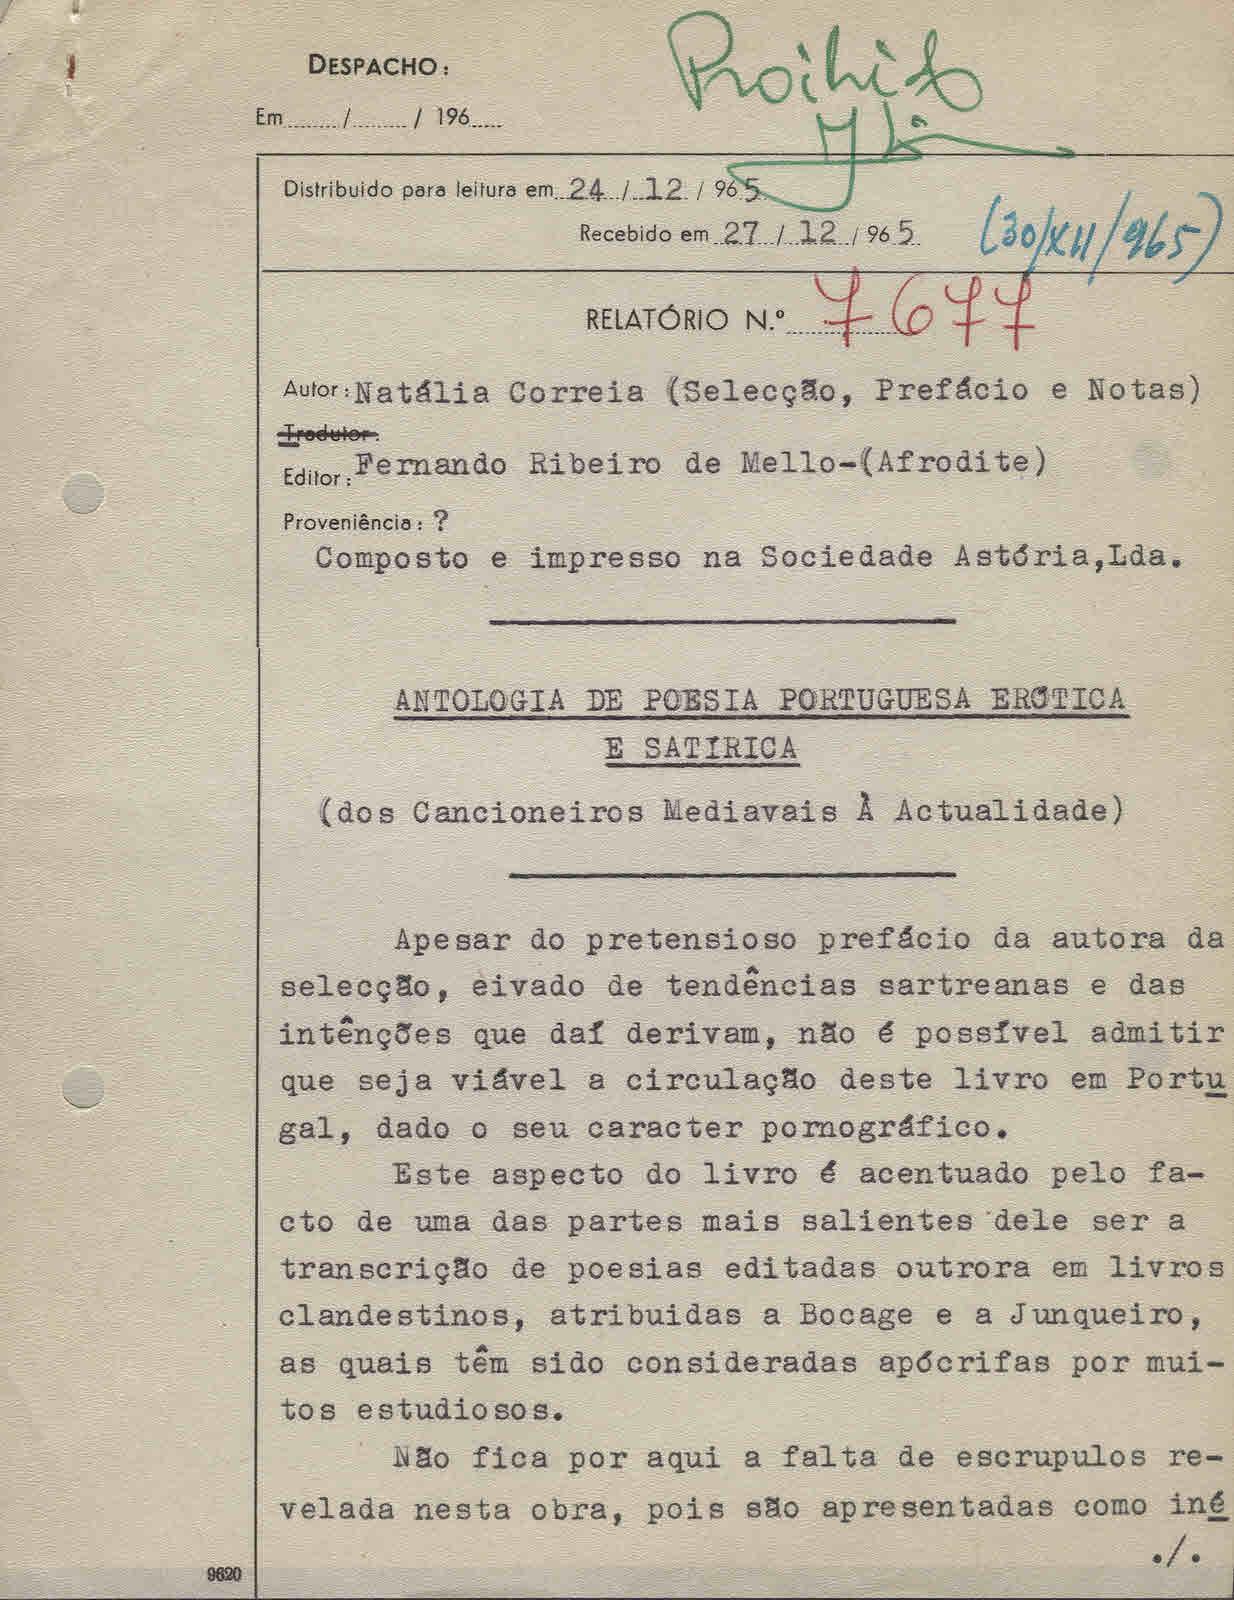 CORREIA (Natália).— ANTOLOGIA DE POESIA PORTUGUESA ERÓTICA E SATÍRICA. (Dos Cancioneiros Medievais à Actualidade).